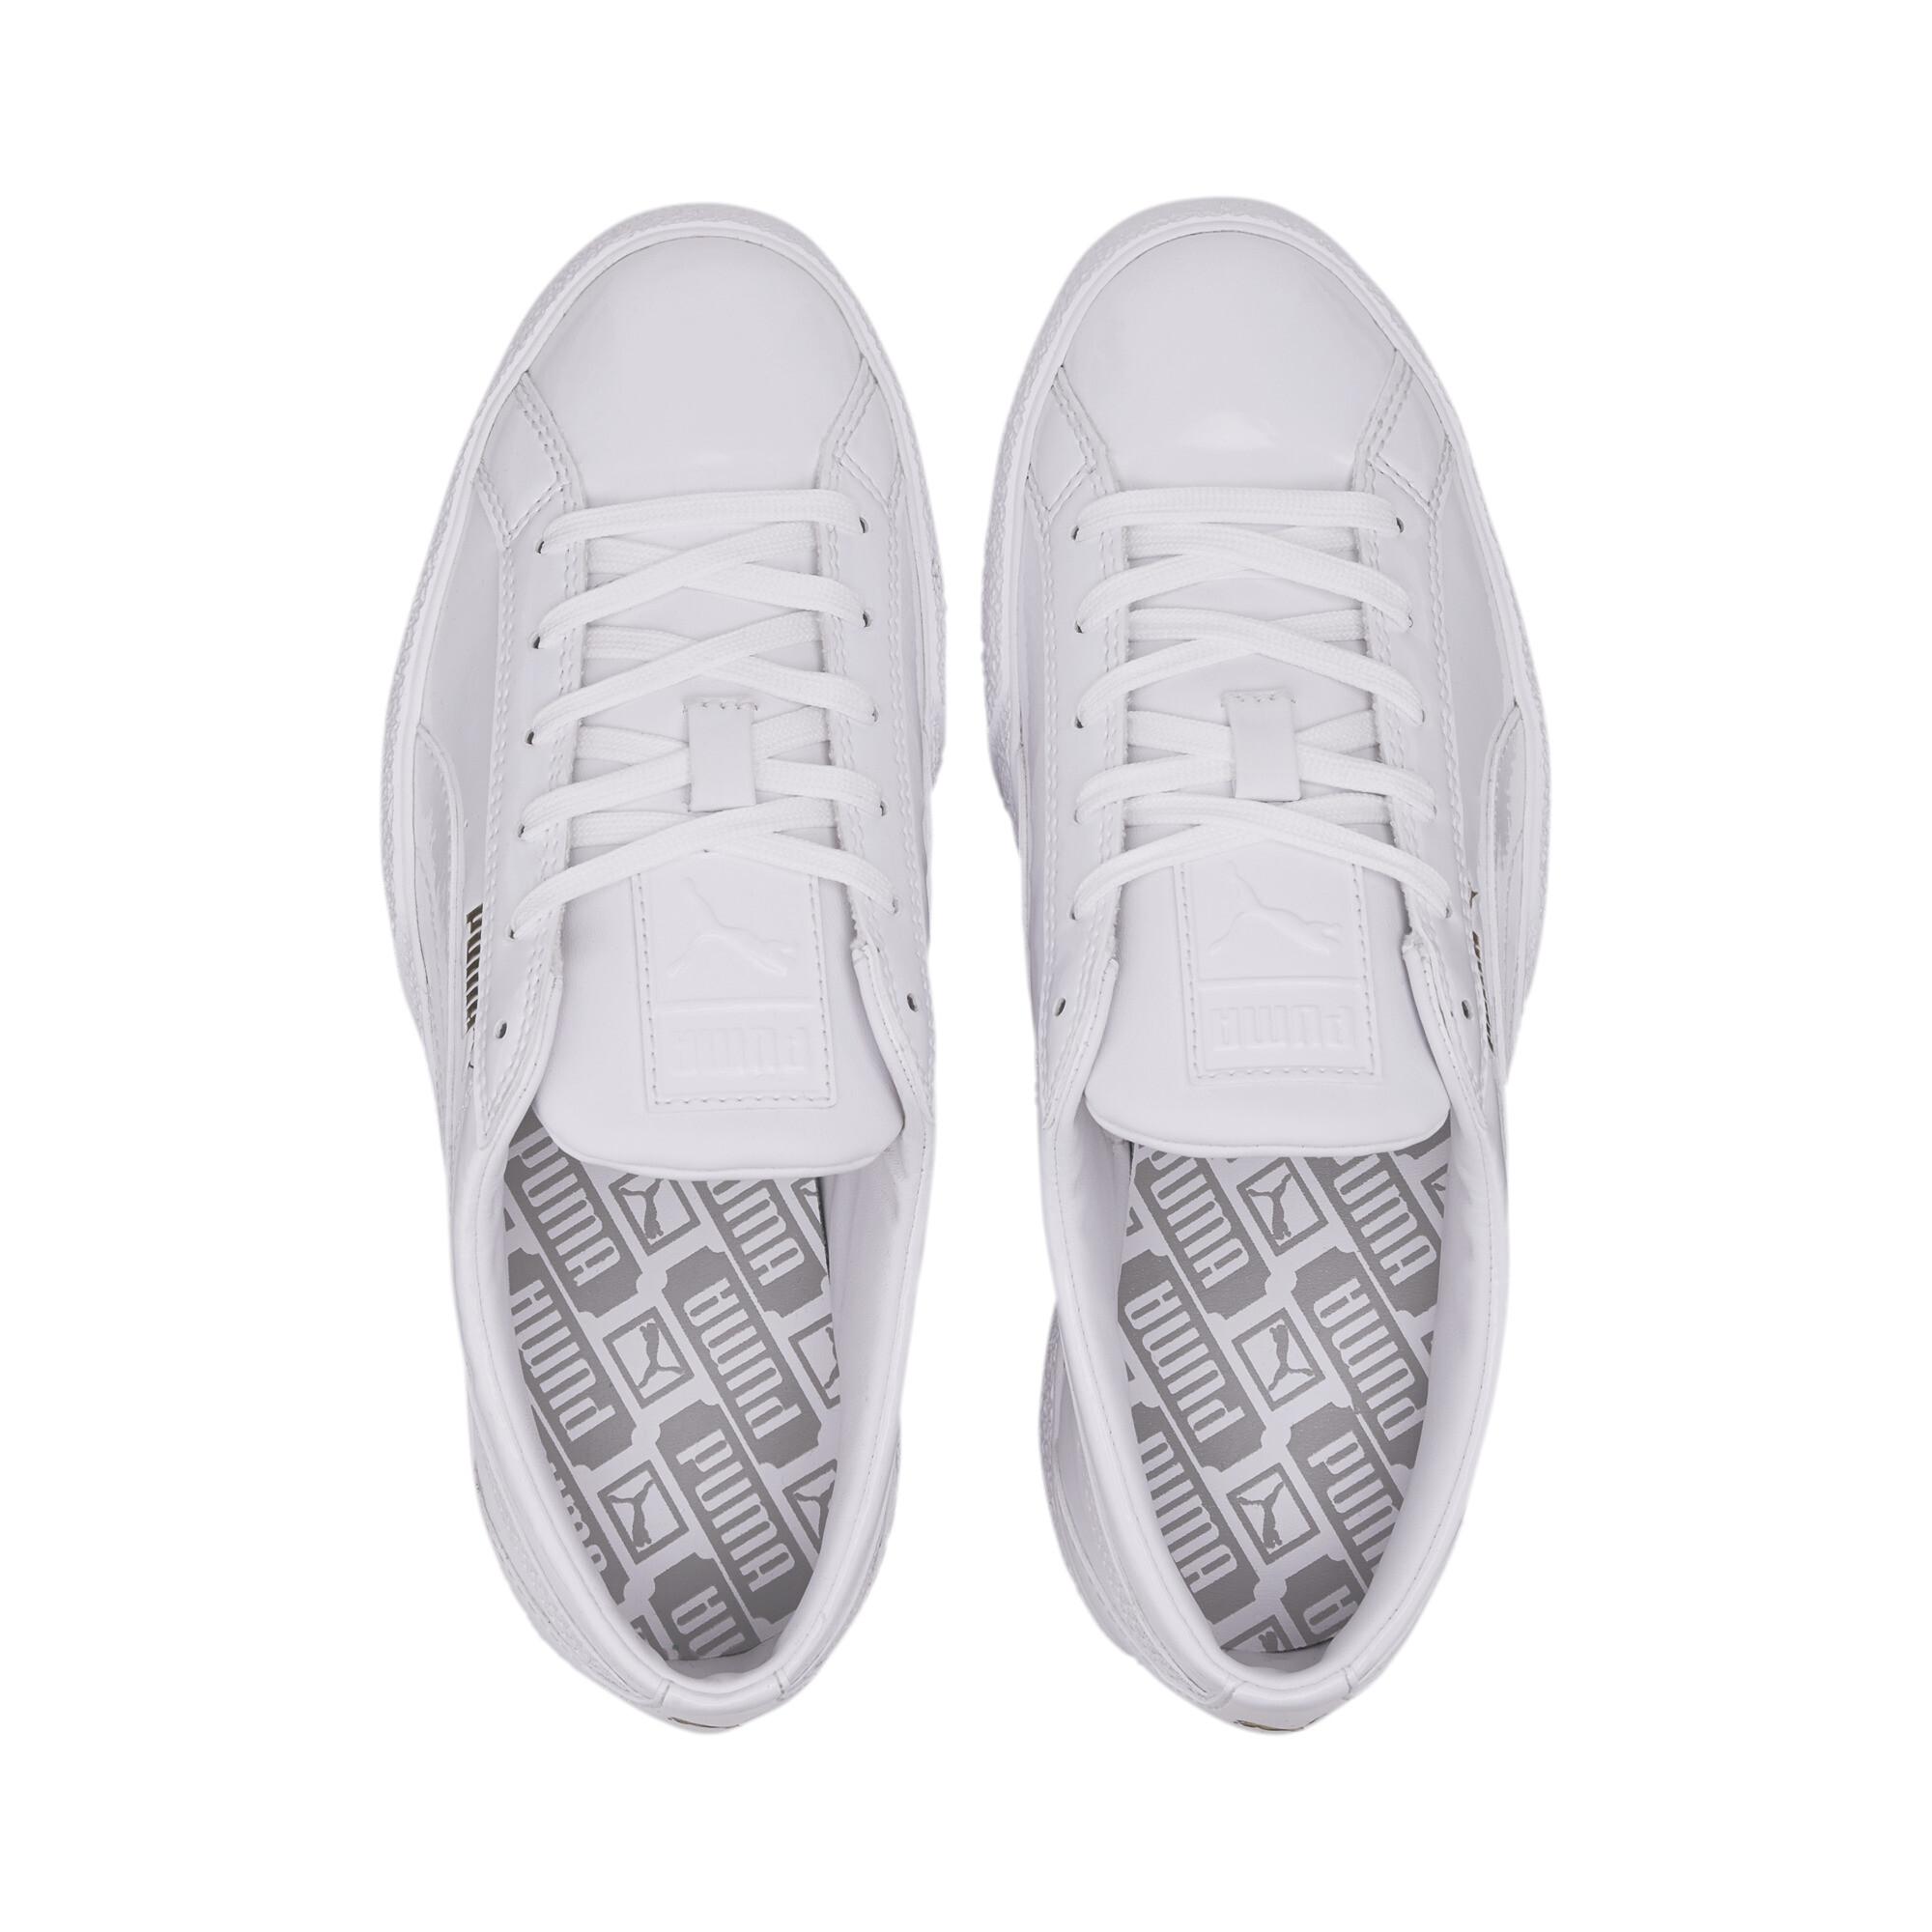 PUMA-Women-039-s-Love-Patent-Sneakers thumbnail 15